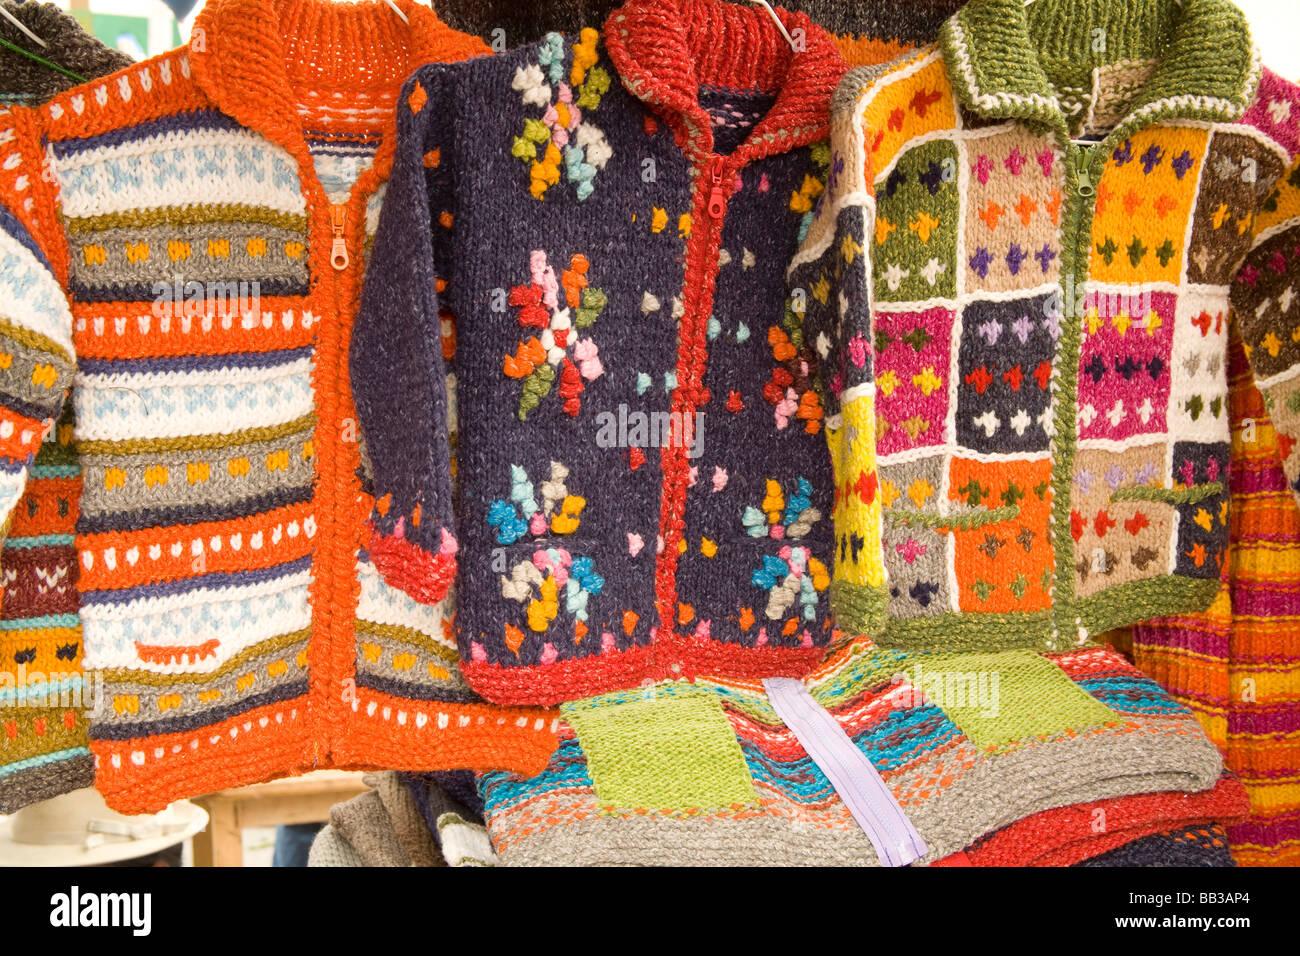 South America, Ecuador, Otavalo,  Plaza de Ponchos, sweaters on display at the Saturday textile & crafts market - Stock Image